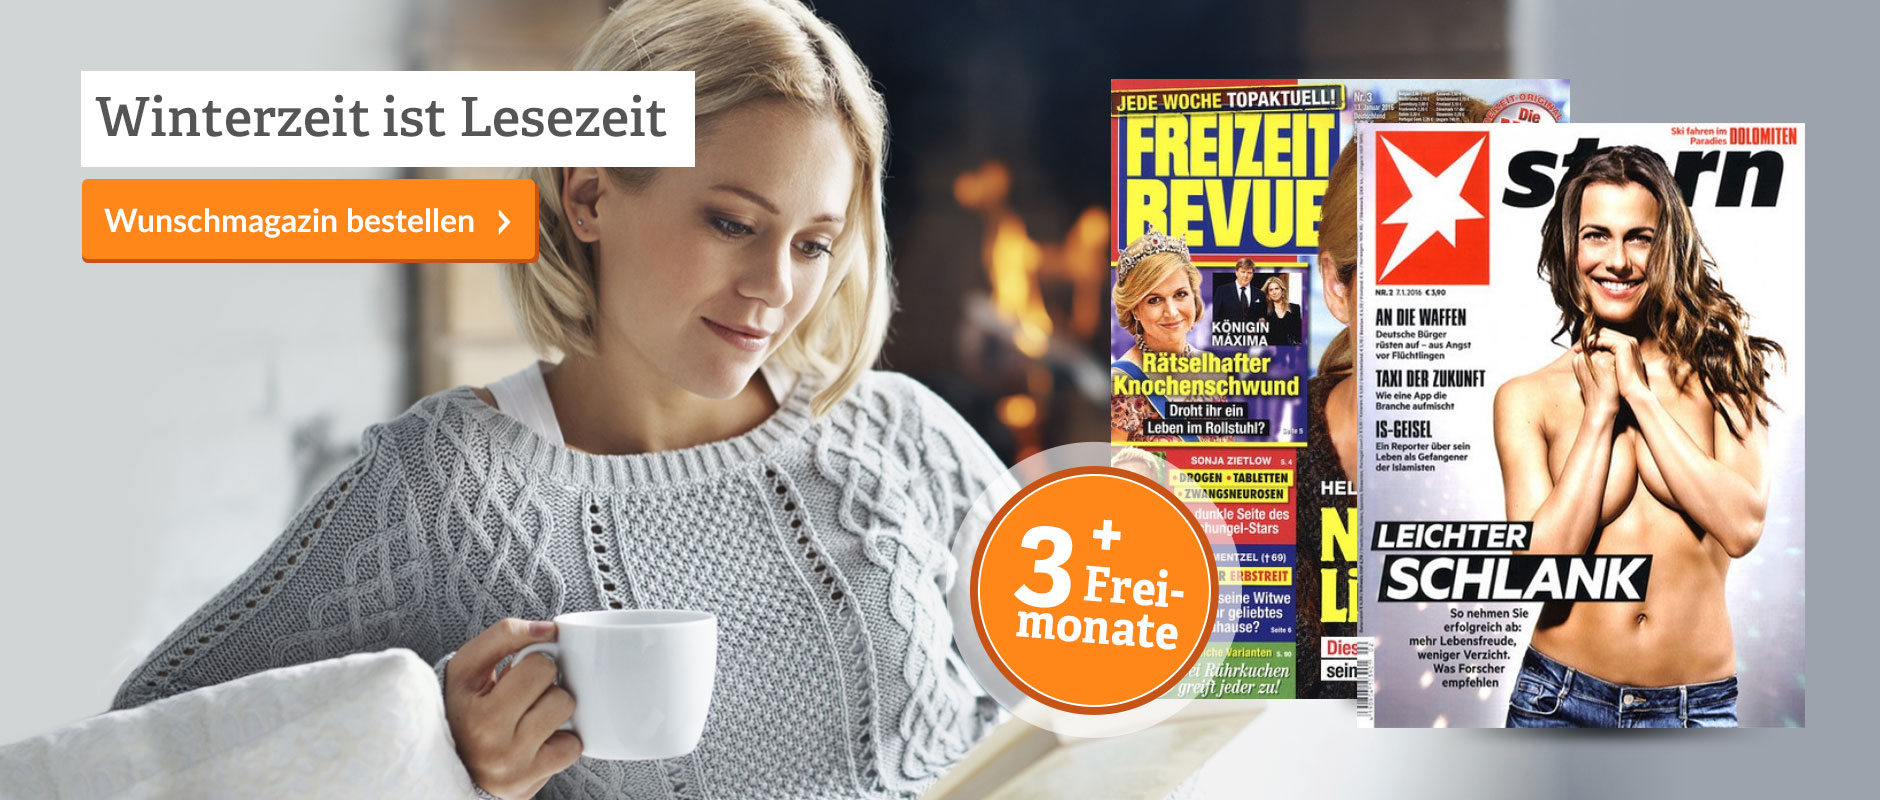 mainteaser_02-Winterzeit